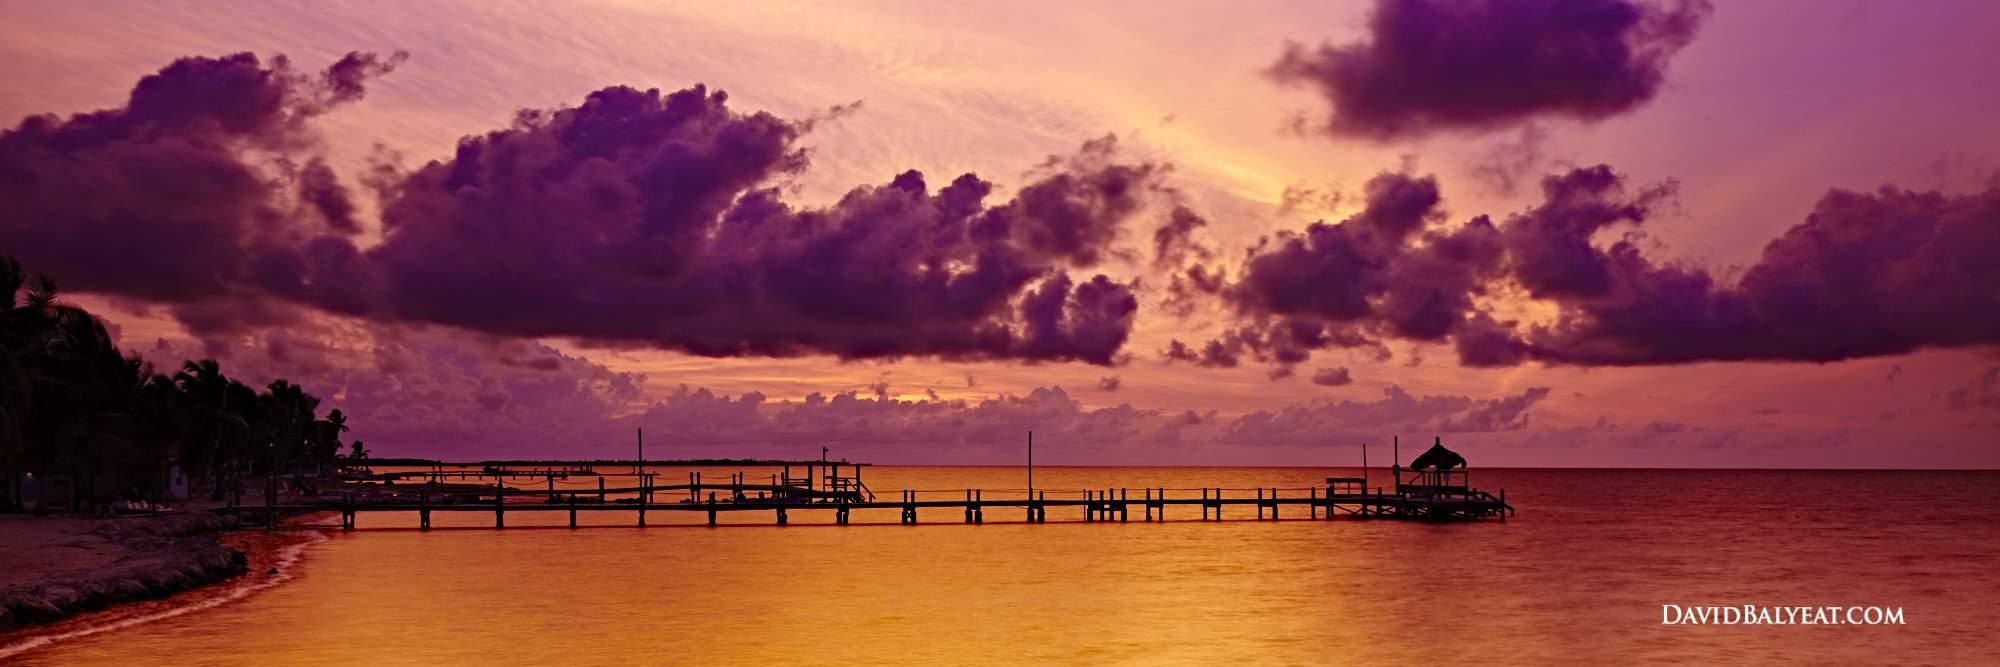 Miami And Florida Keys David Balyeat Photography Portfolio